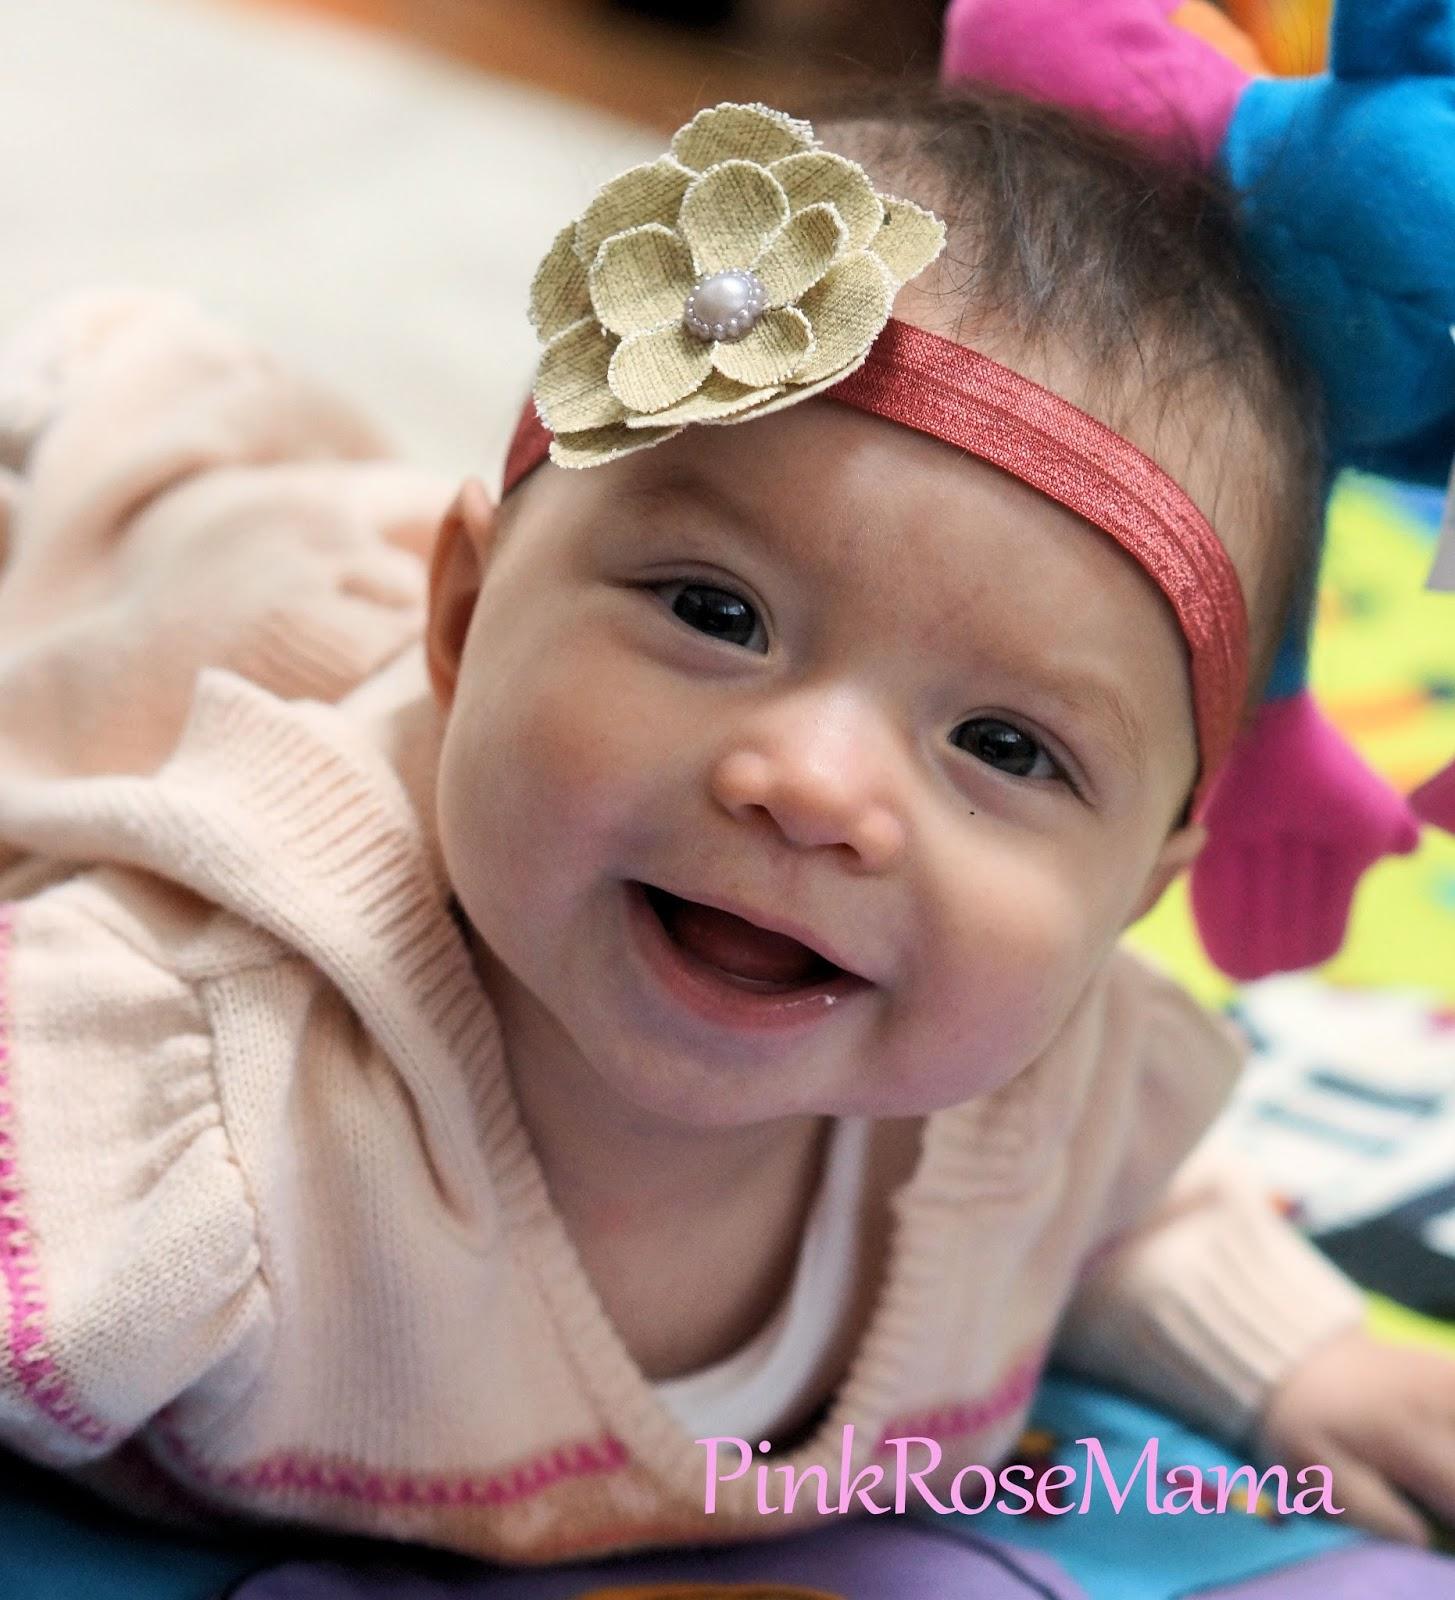 Pink Rose Mama: DIY Baby Headbands